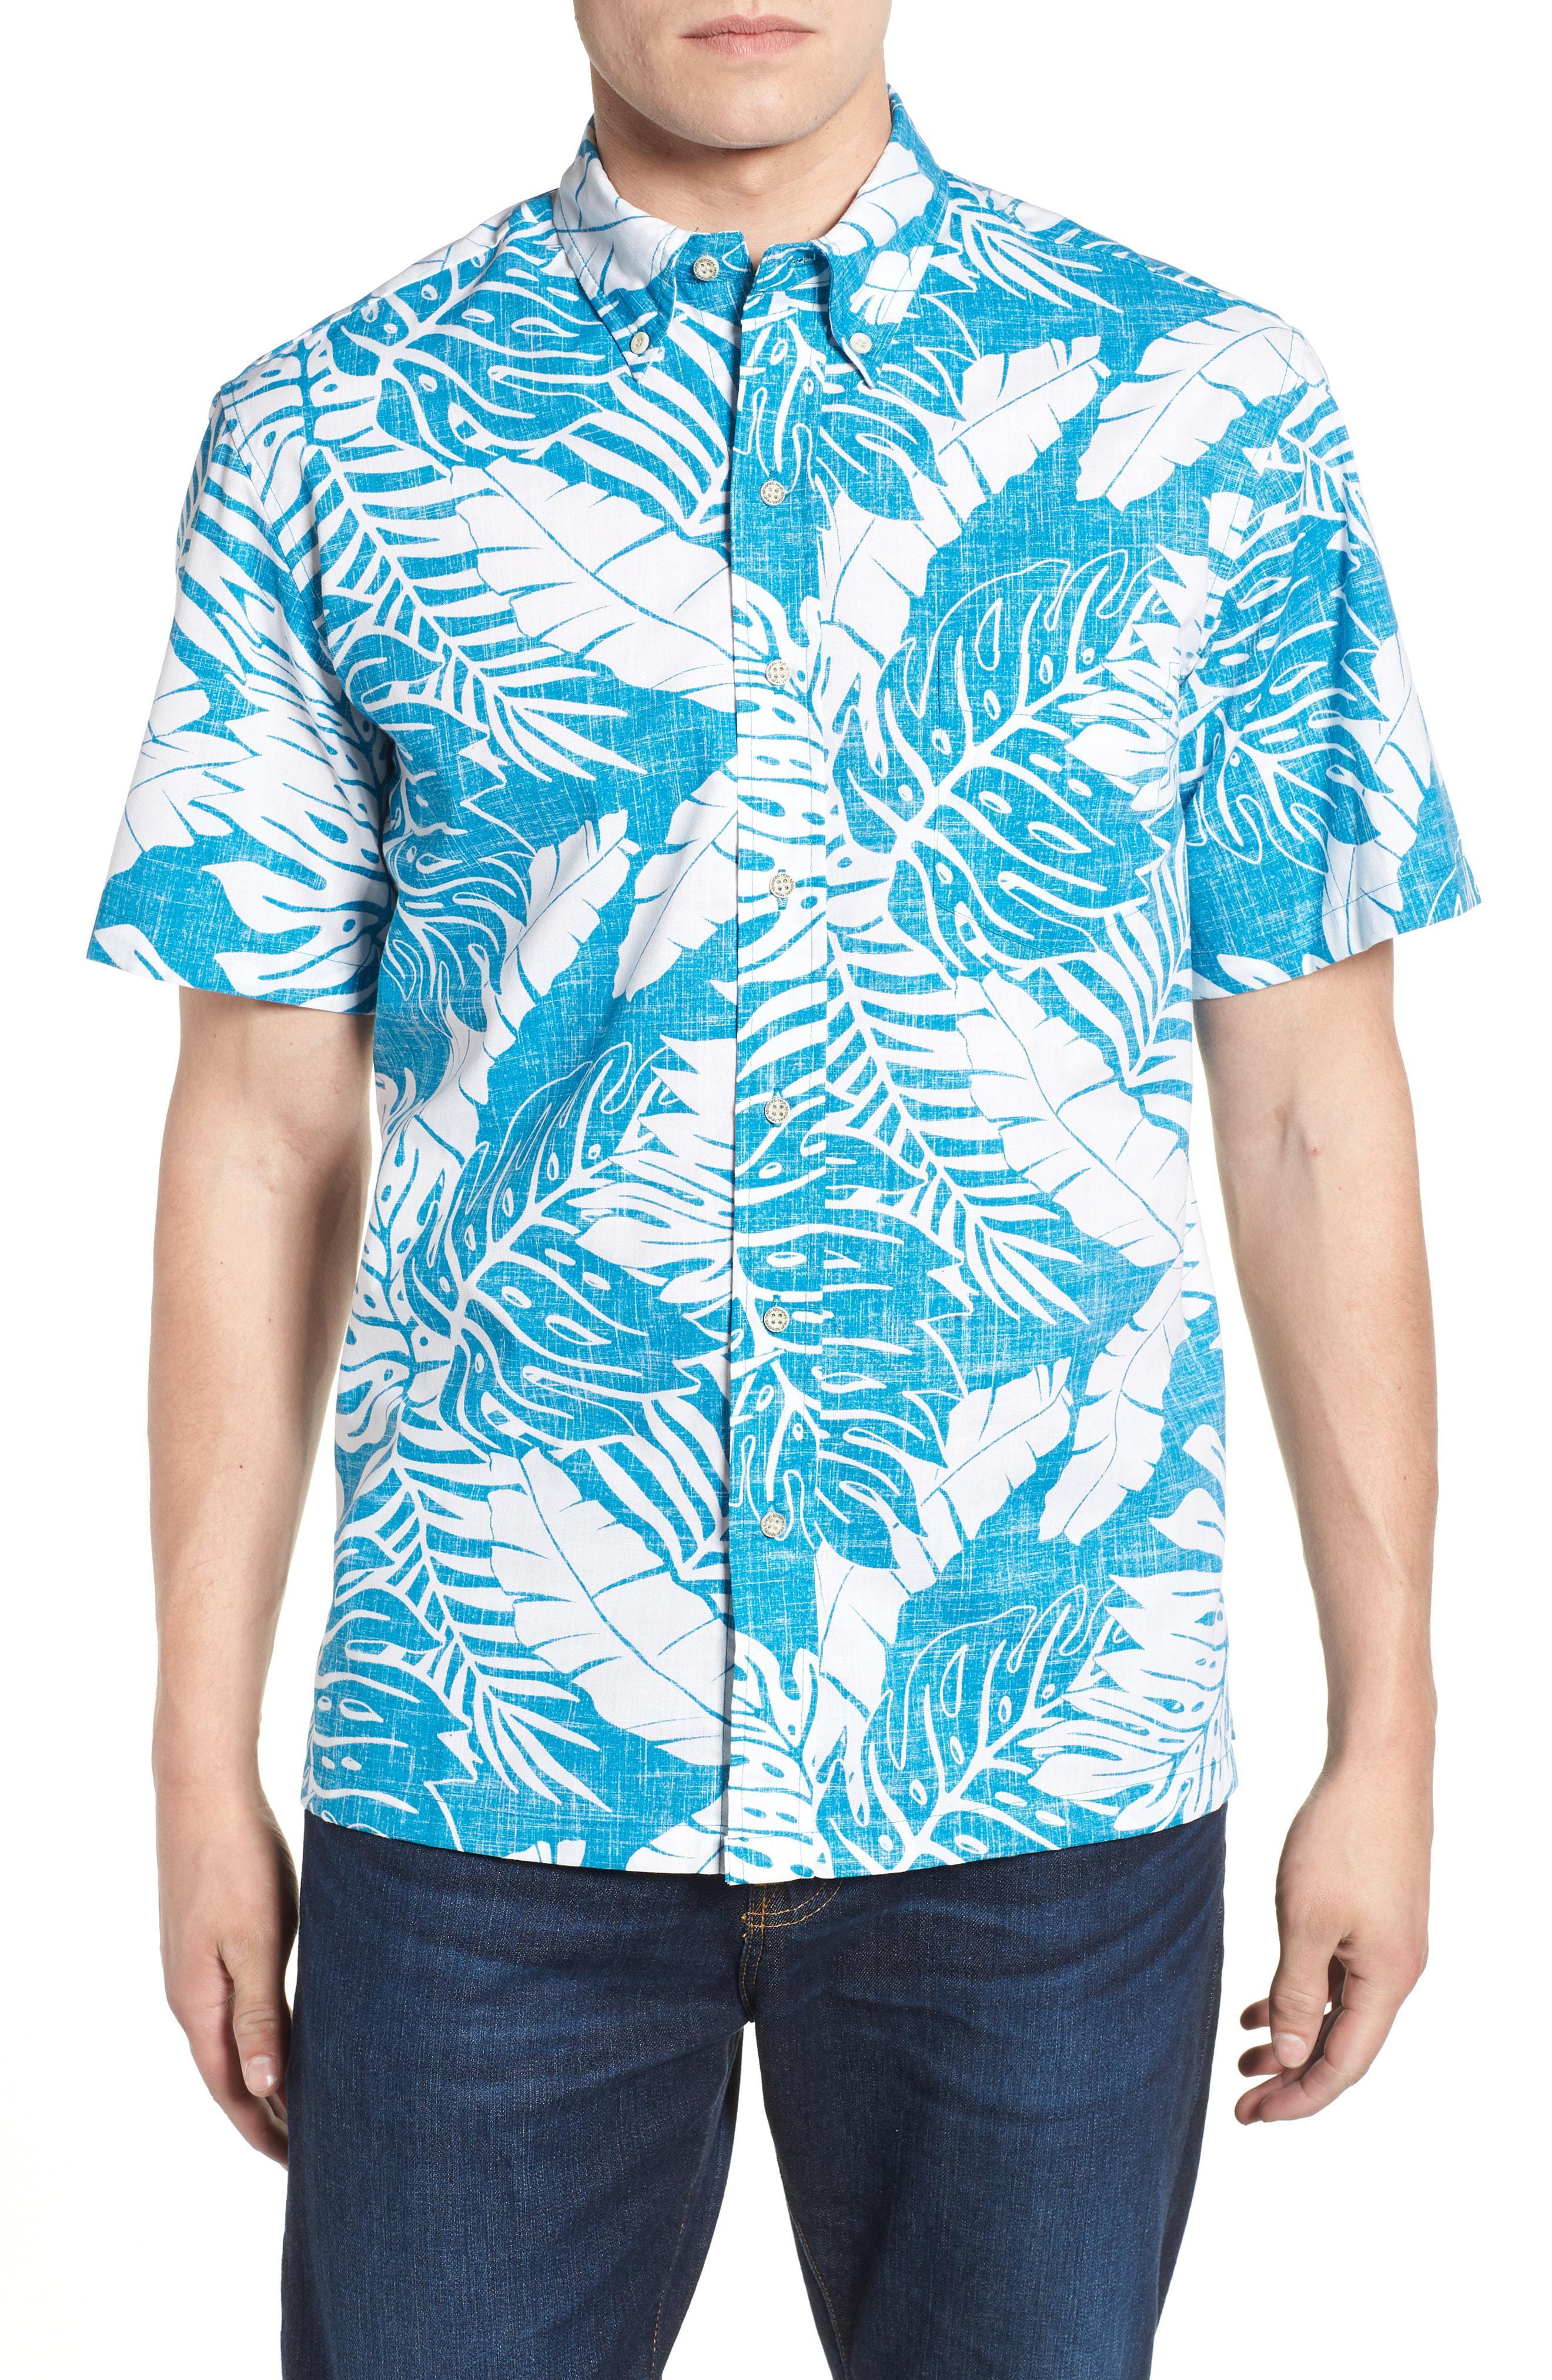 32d4f2f73e0a Lyst - Reyn Spooner Avenue Falls Classic Fit Sport Shirt in Blue for Men